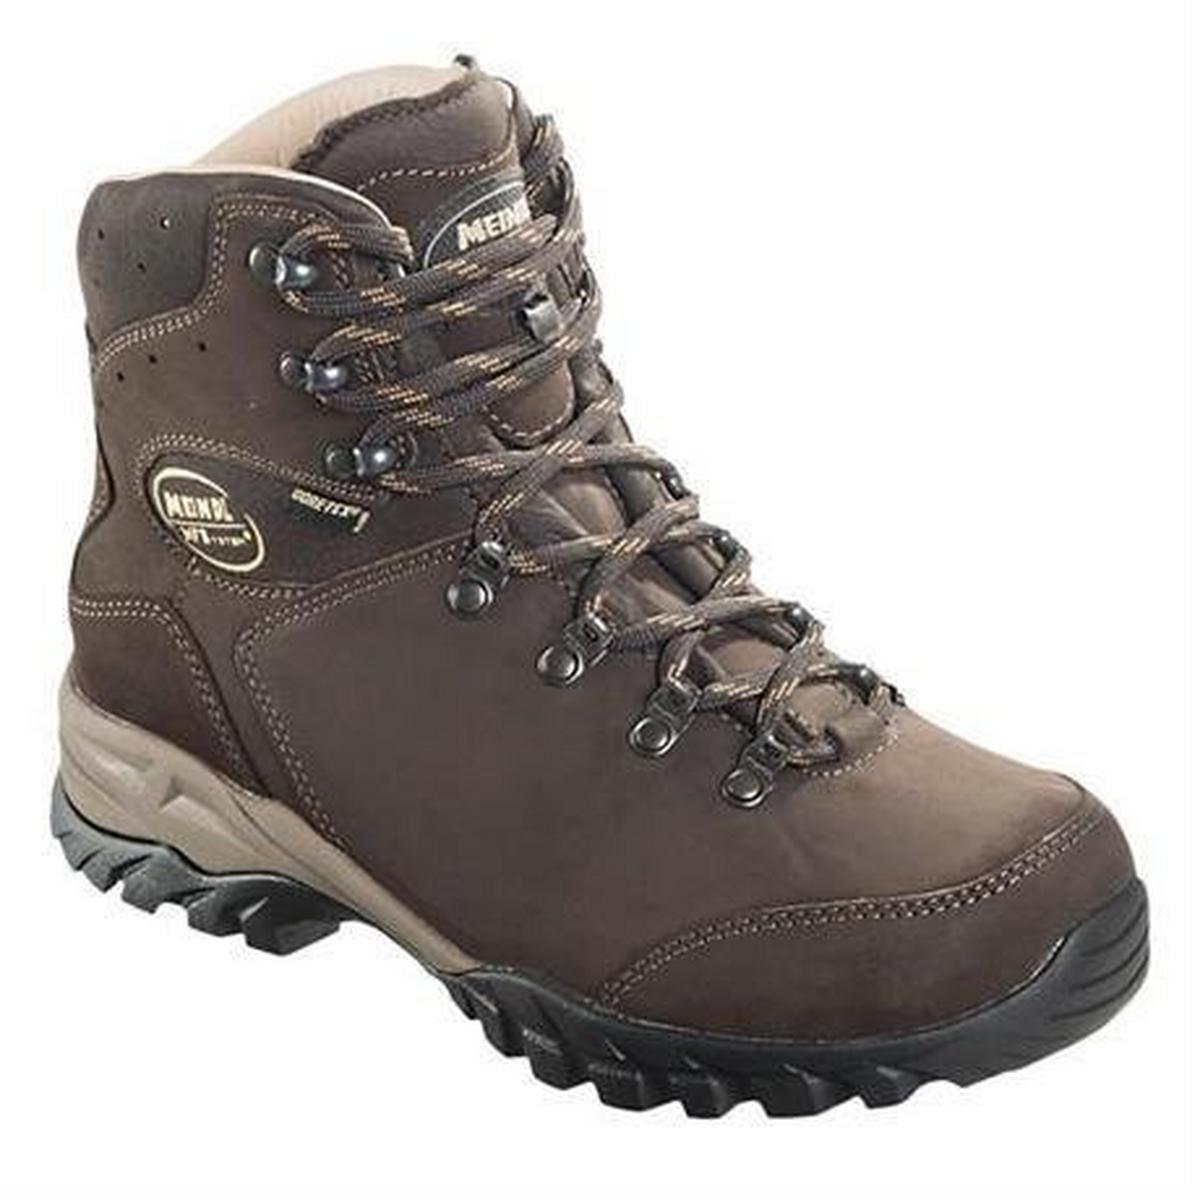 Meindl Men's Meindl Meran GTX Boots - Brown